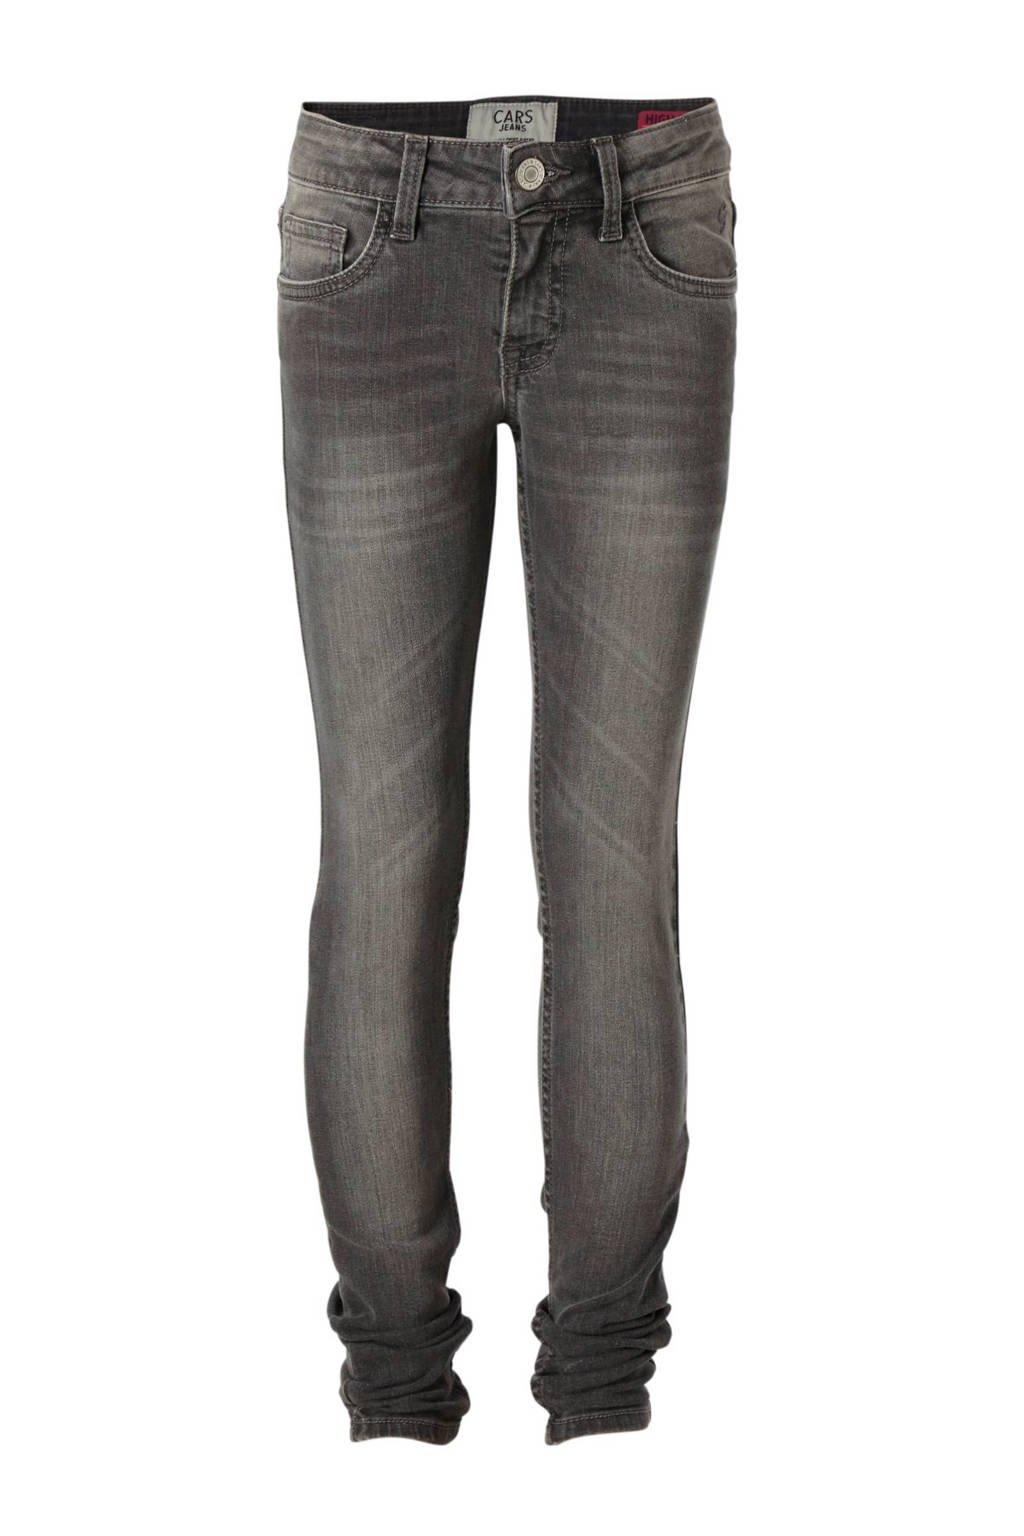 Cars high waist skinny jeans Haletta grijs, Grijs